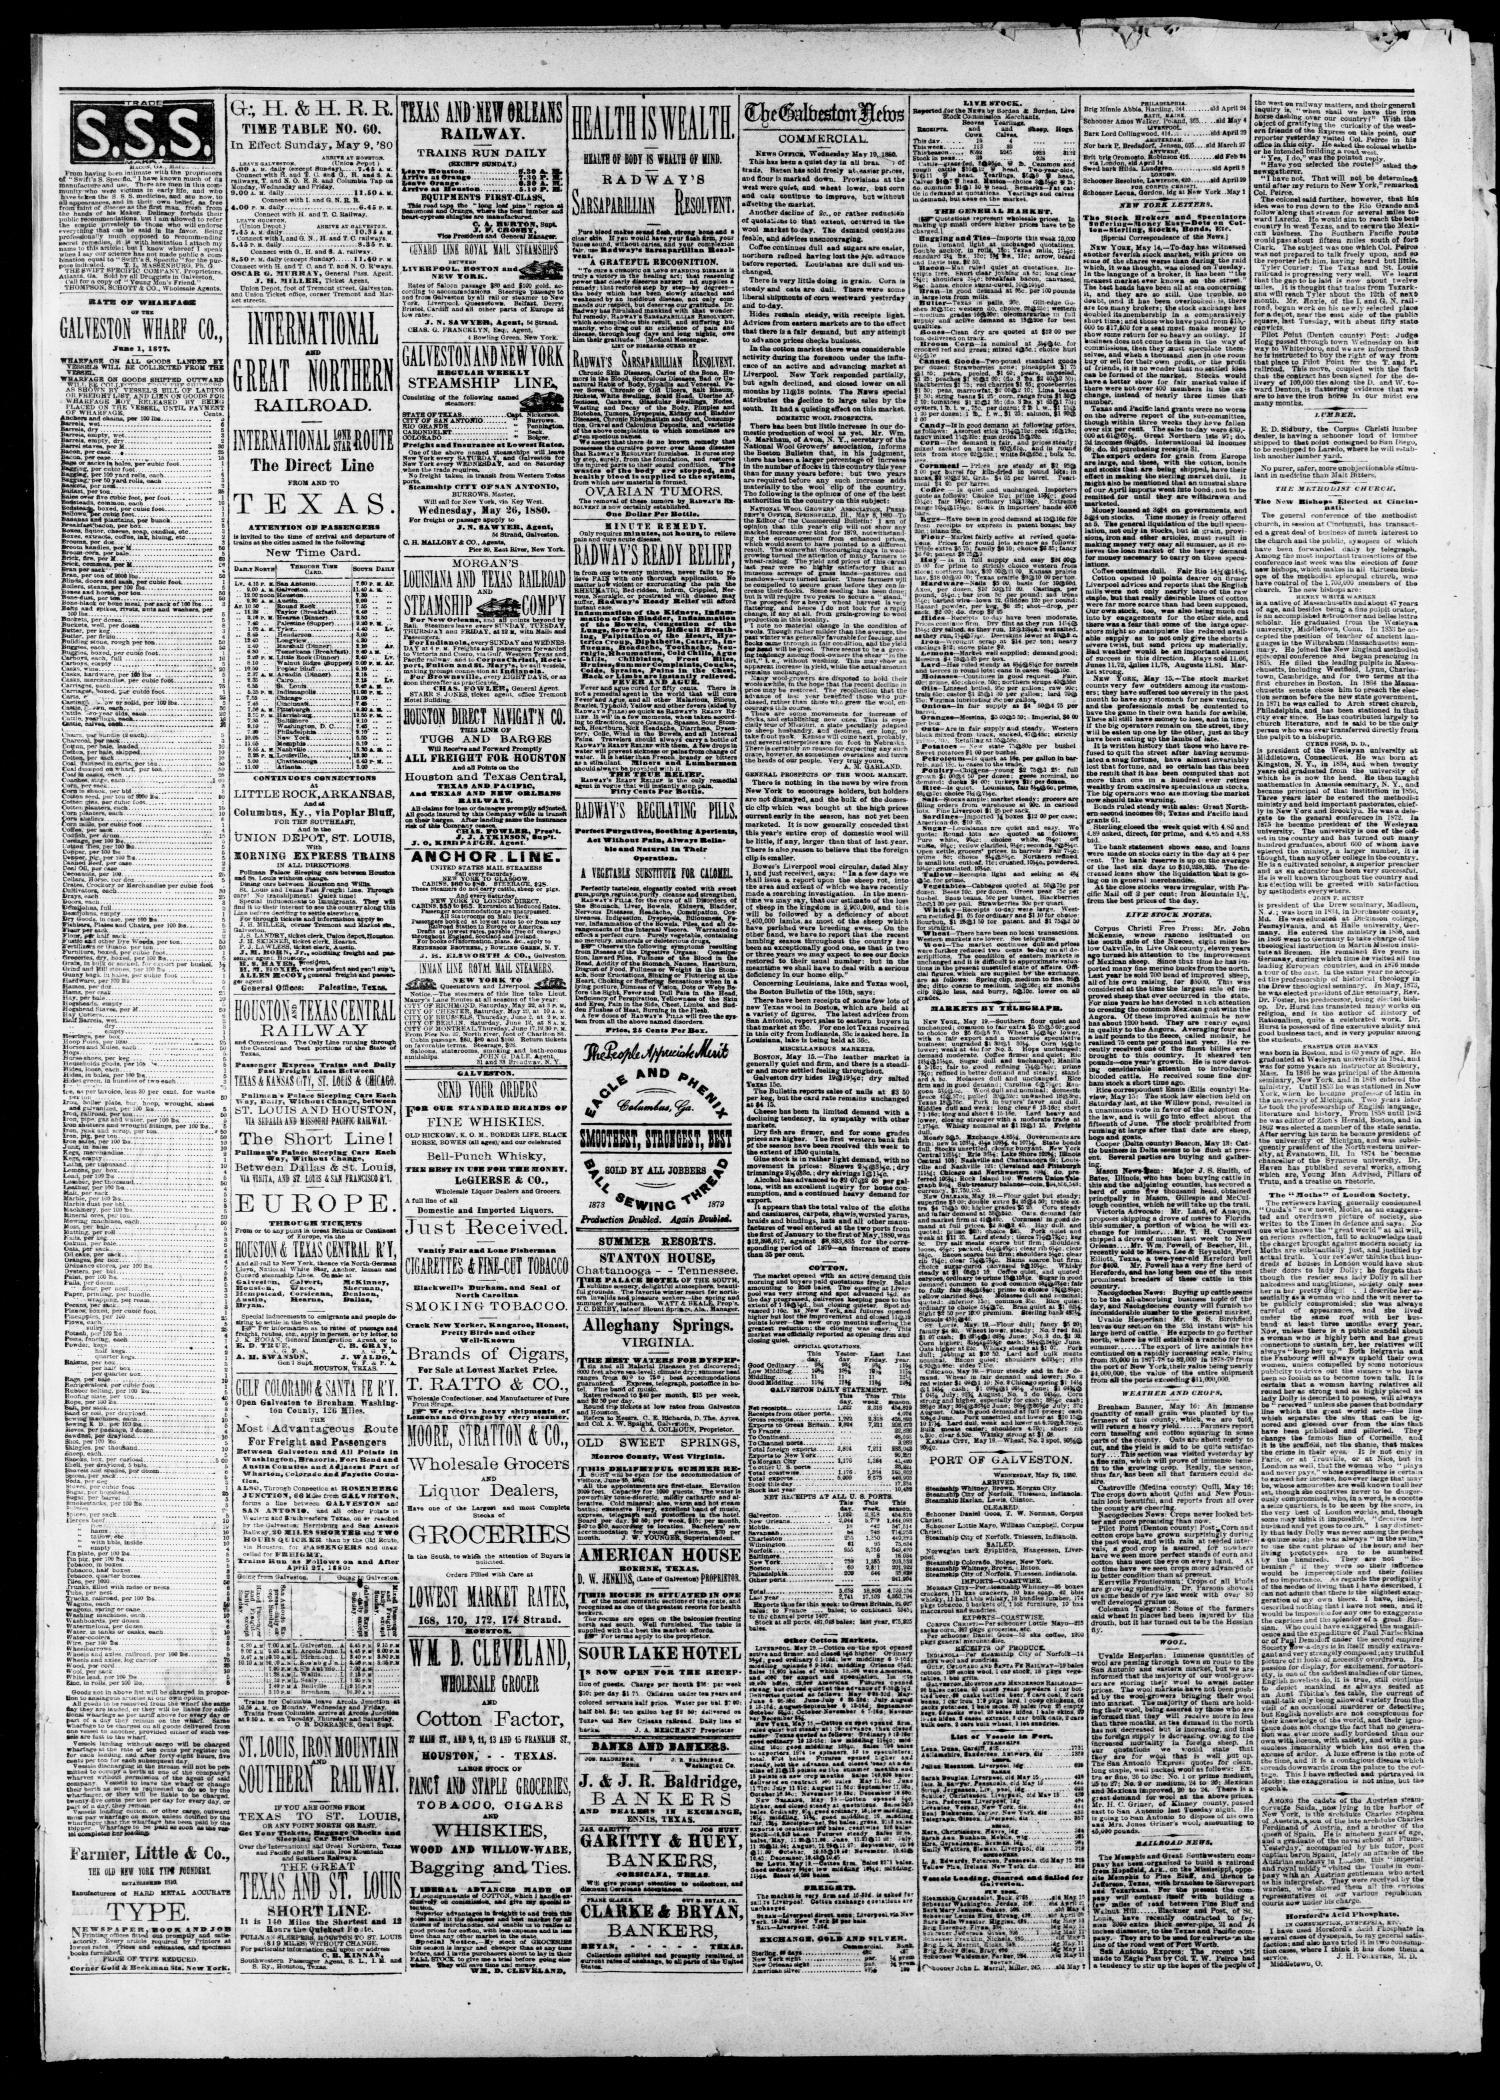 54217d7c997c7 The Galveston Daily News. (Galveston, Tex.), Vol. 39, No. 50, Ed. 1  Thursday, May 20, 1880 - Page 3 of 4 - The Portal to Texas History